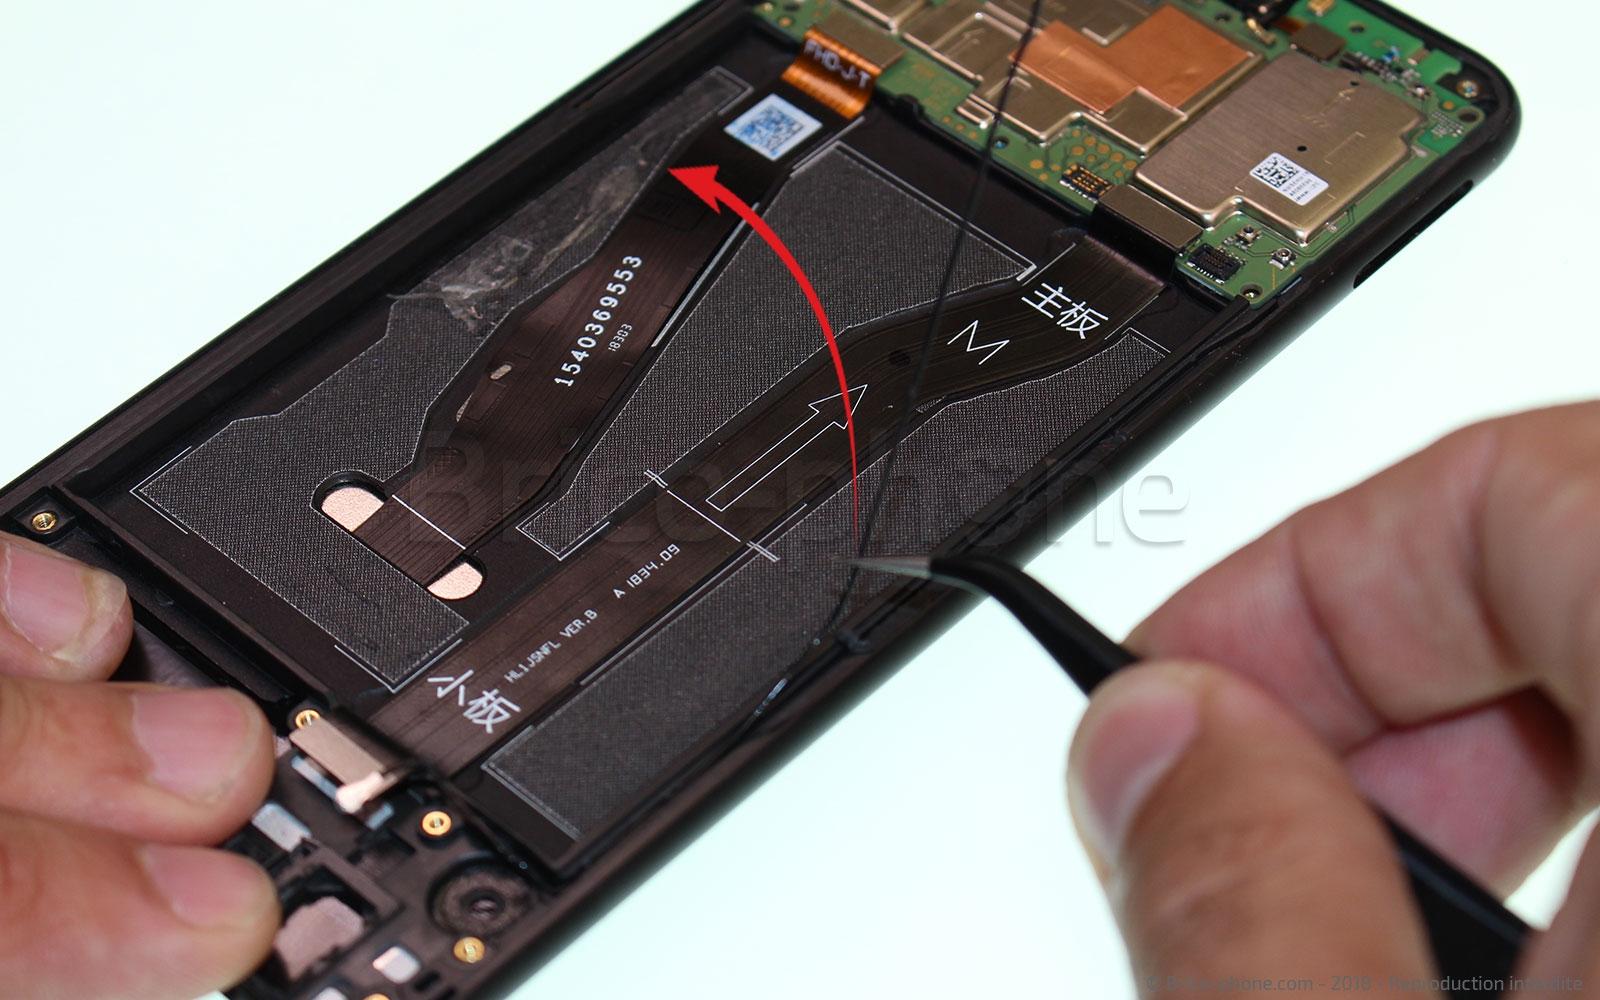 Etape 10 : Retirer le câble antenne